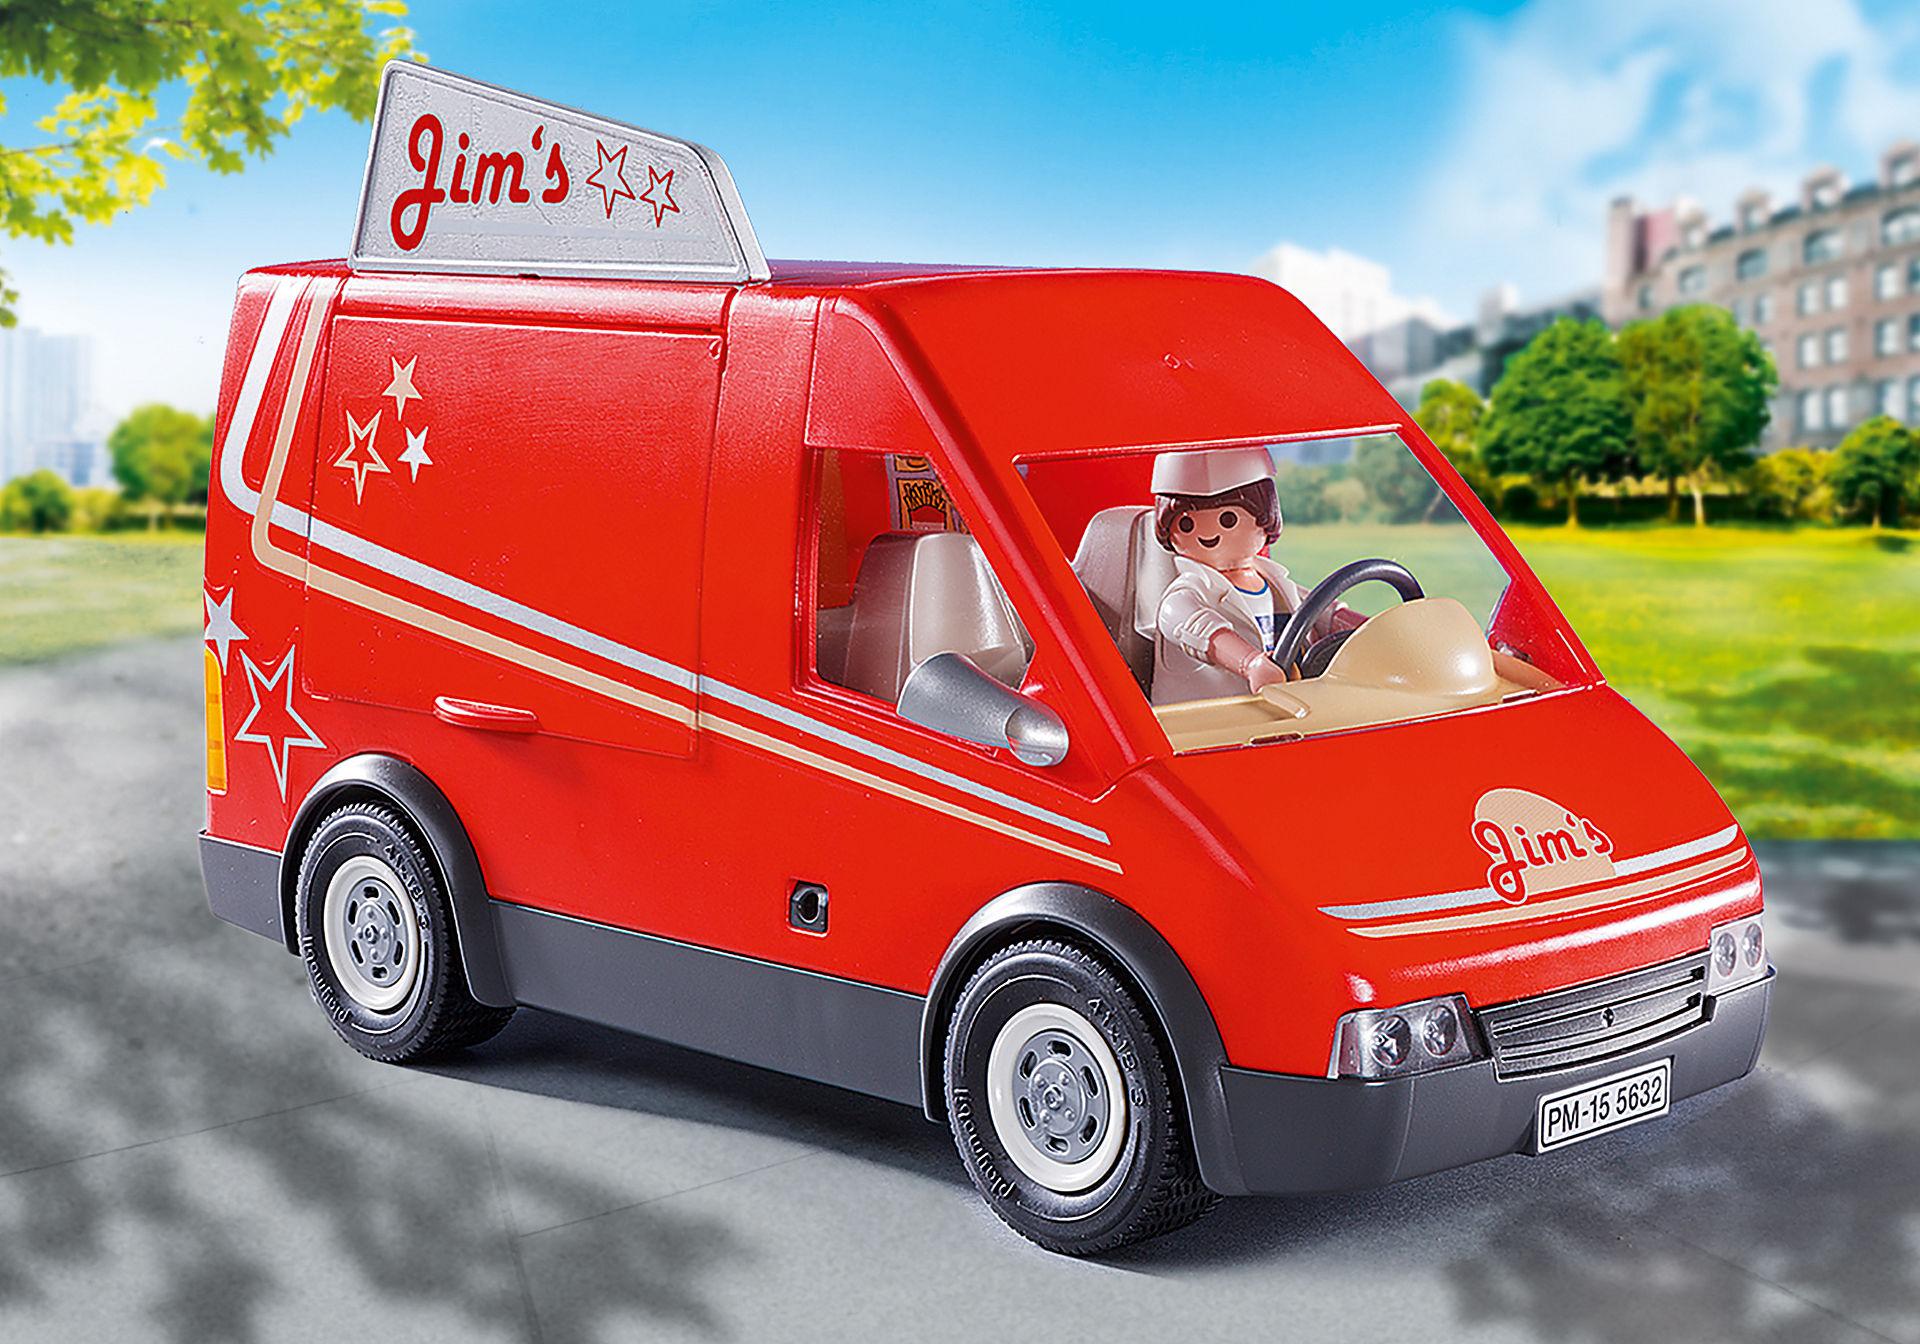 http://media.playmobil.com/i/playmobil/5677_product_extra1/City Food Truck